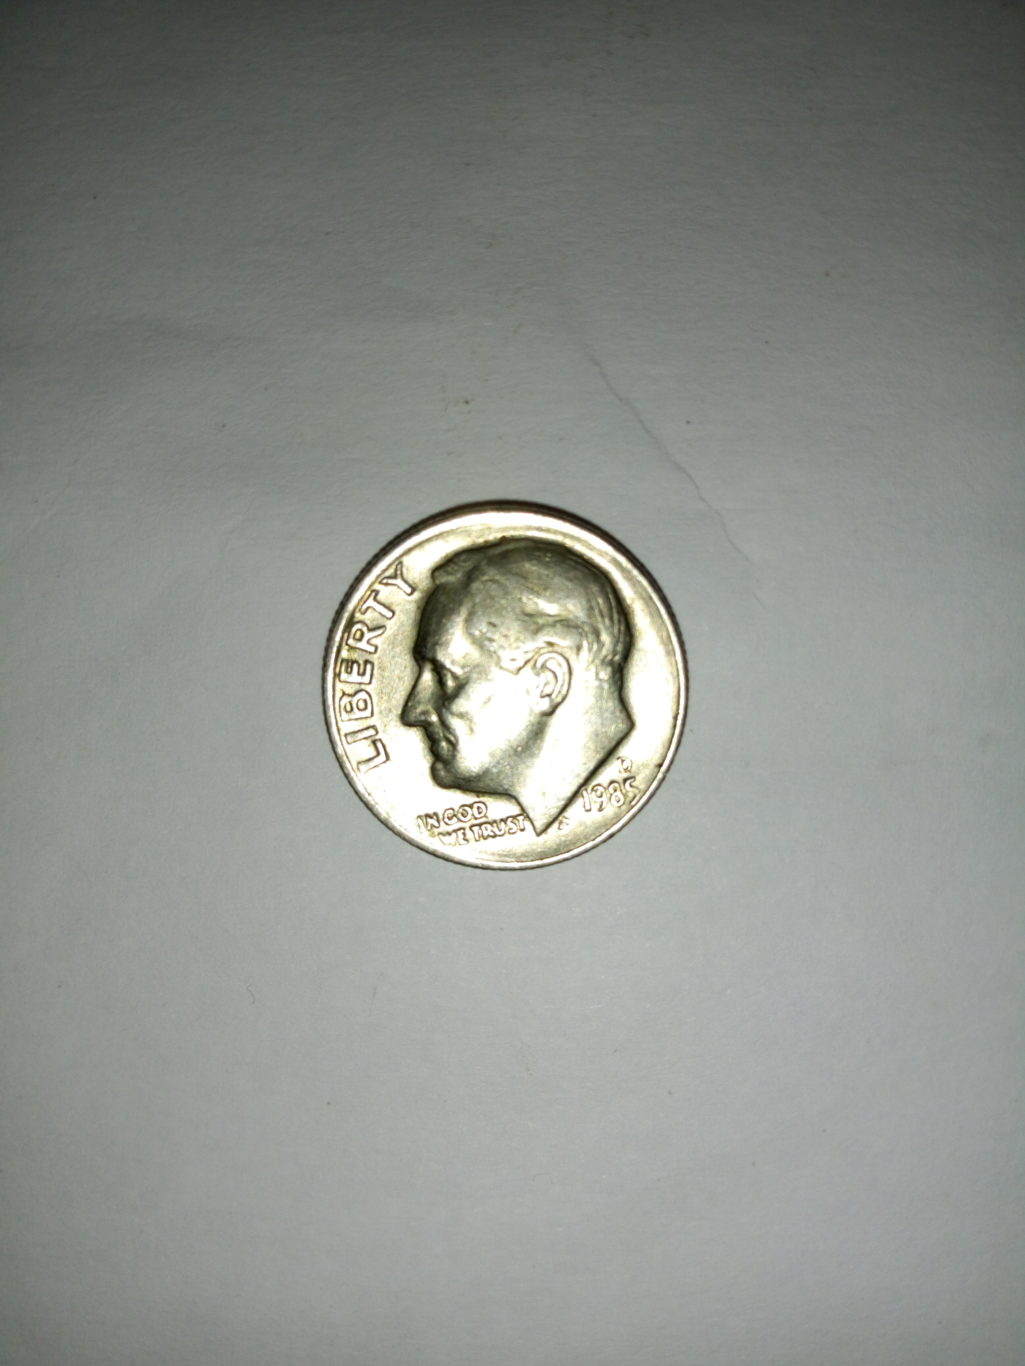 1985_united States of America 1 dime